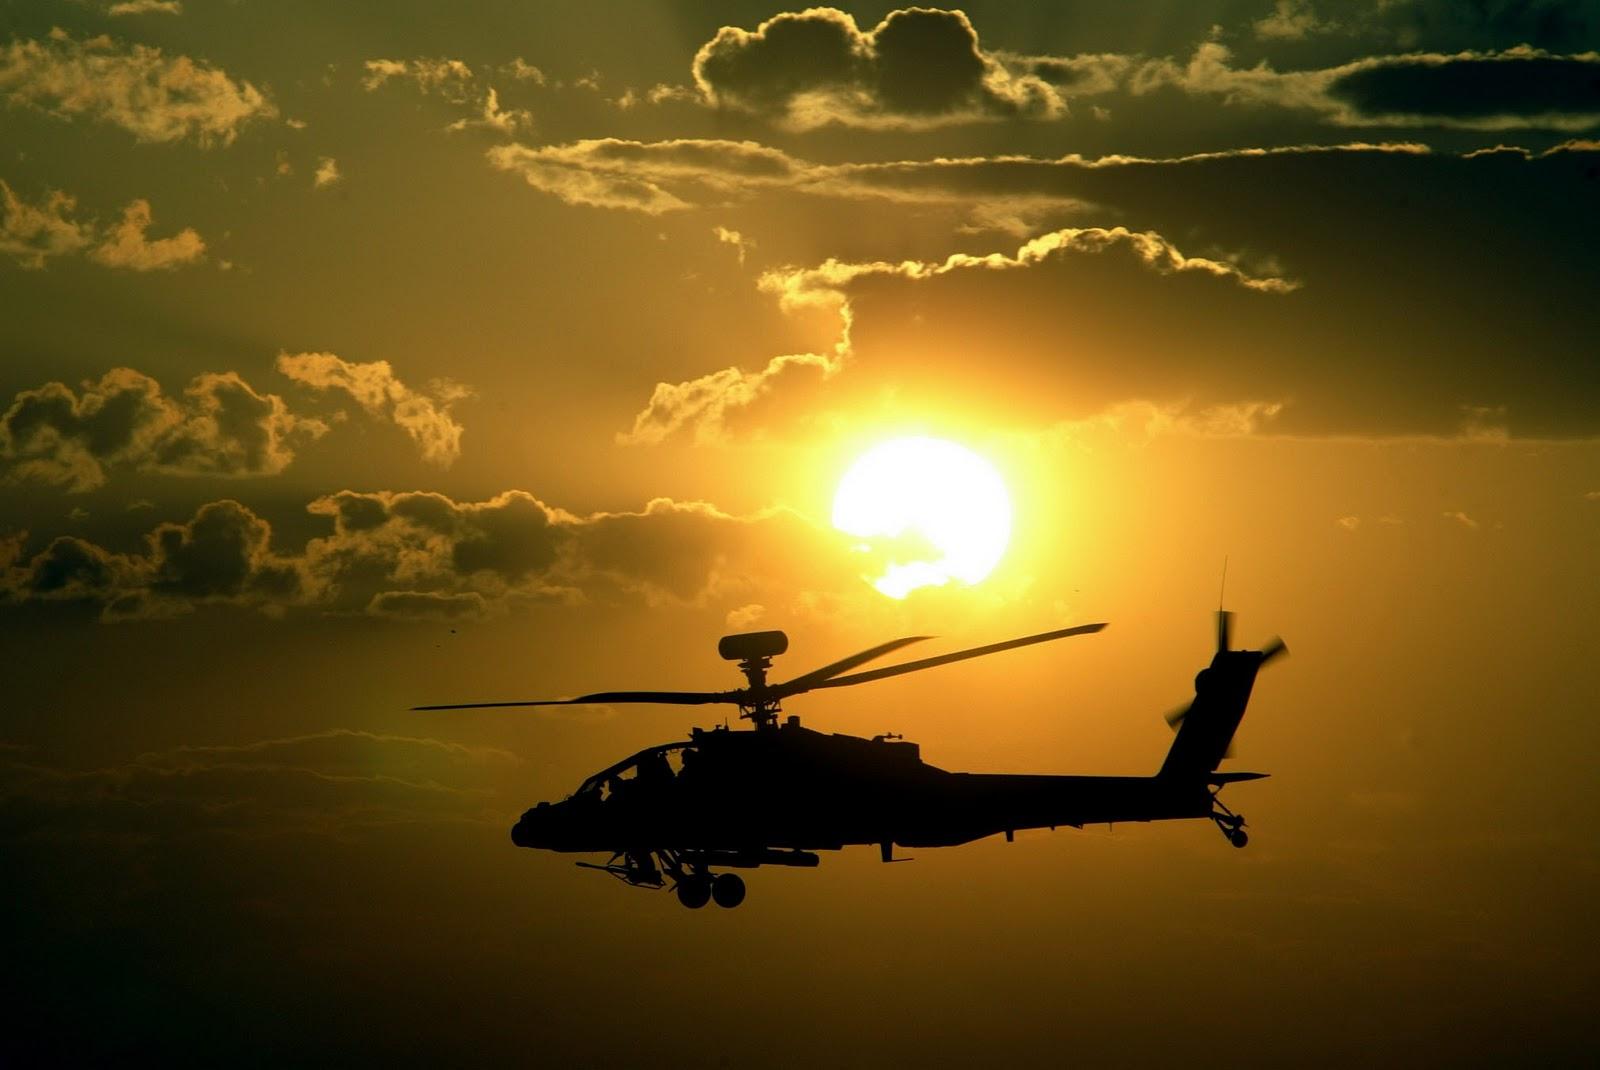 helicopter wallpaper hd desktop - photo #15